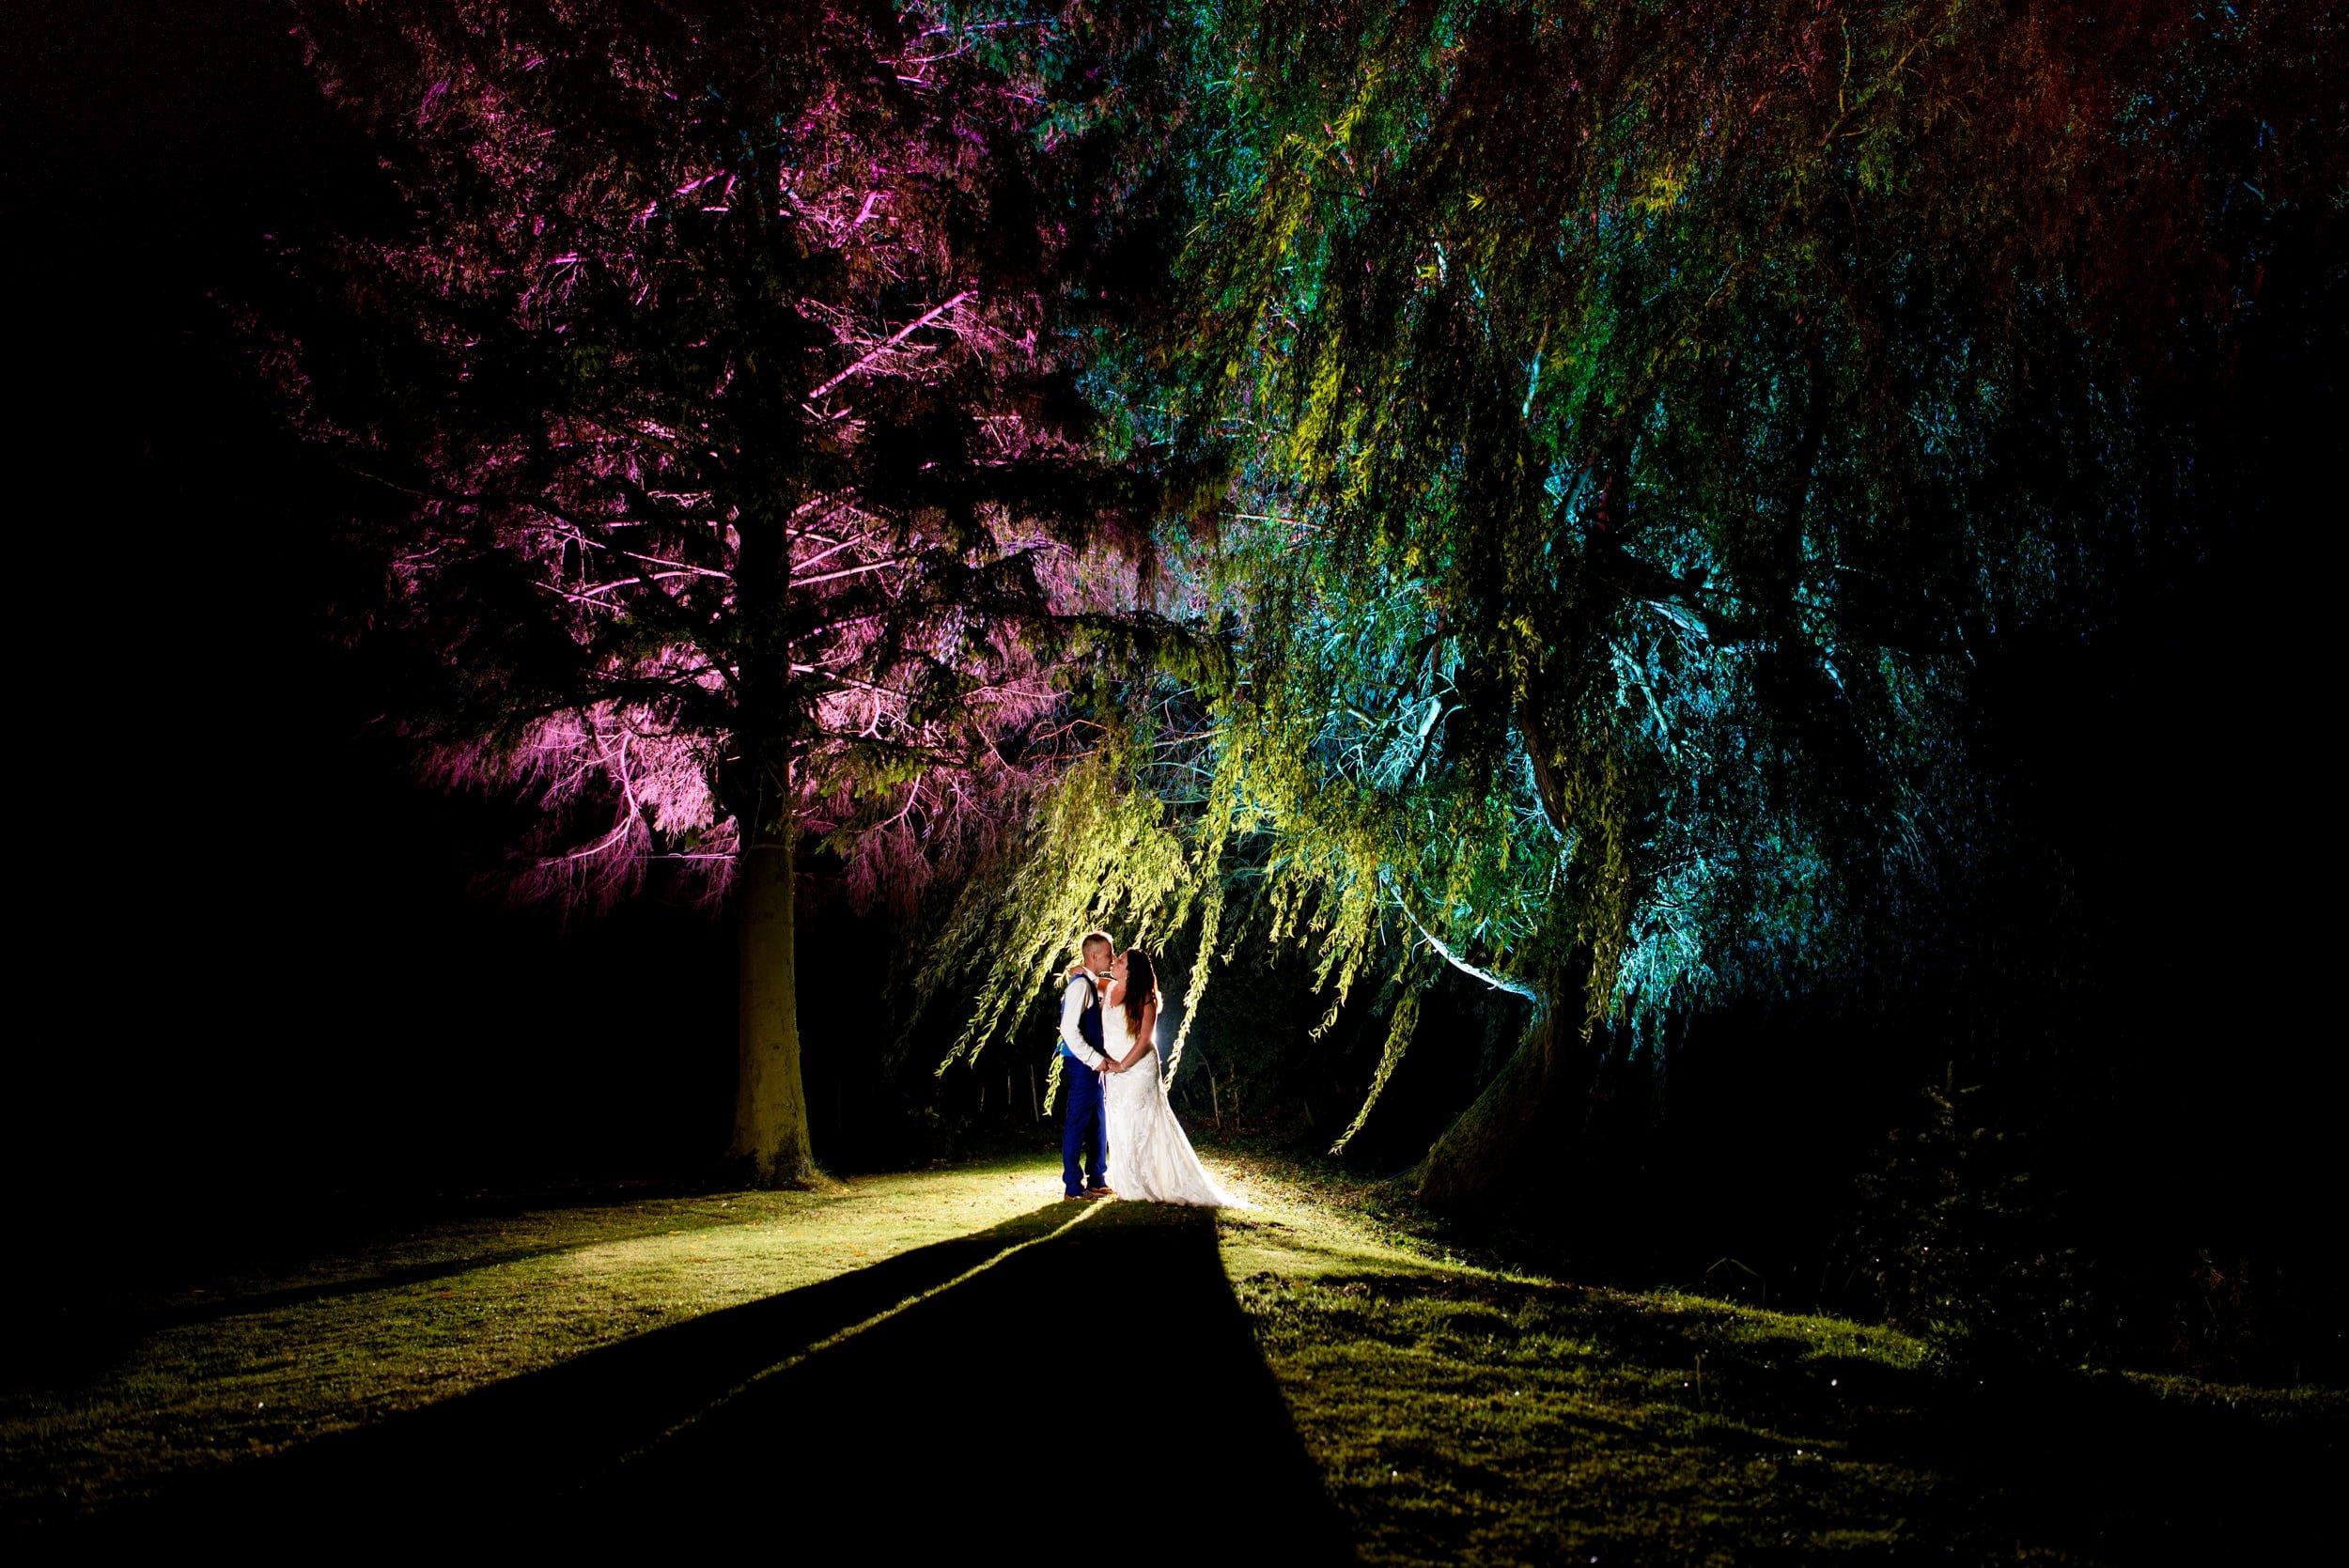 norfolk_wedding_photography_tim_stephenson_1_ts1_9499